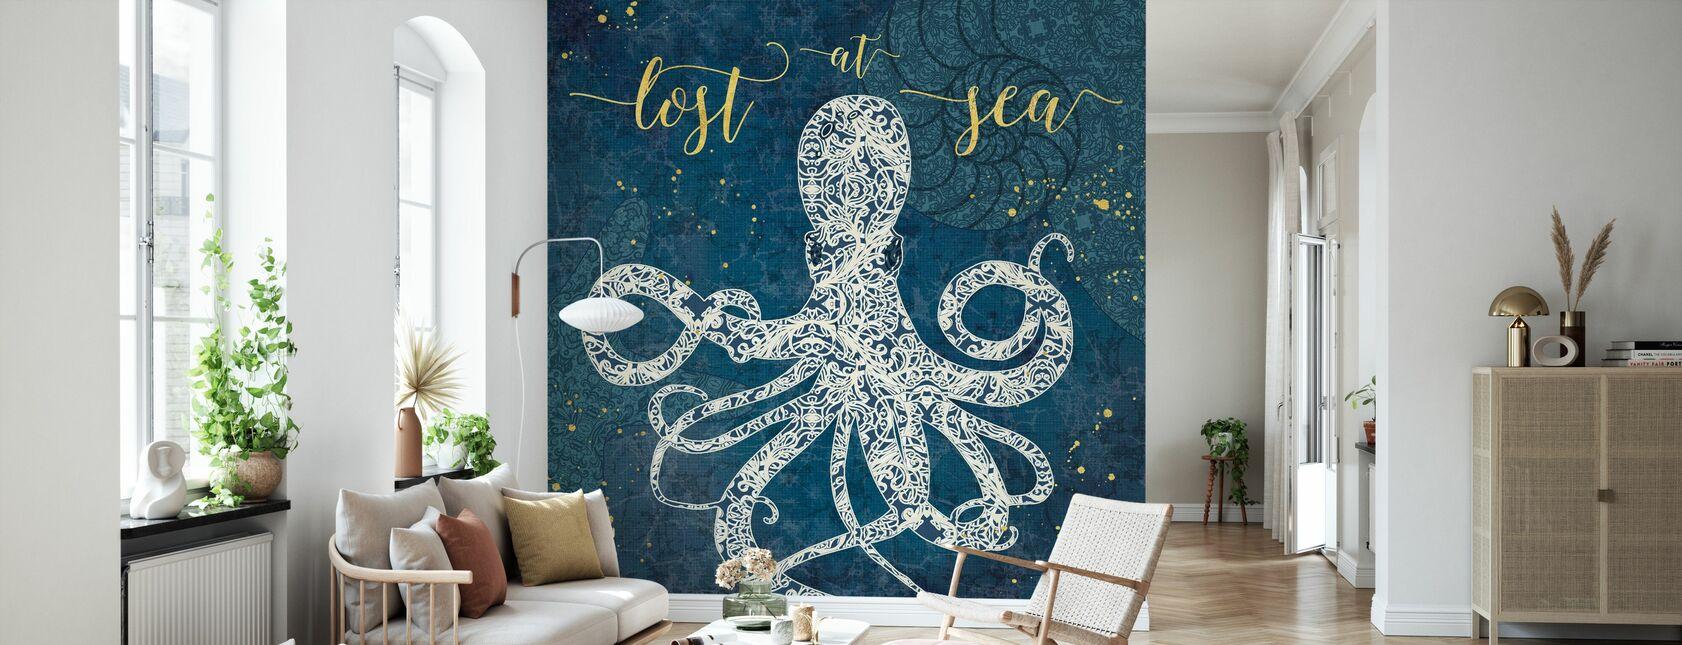 Lost at Sea - Wallpaper - Living Room